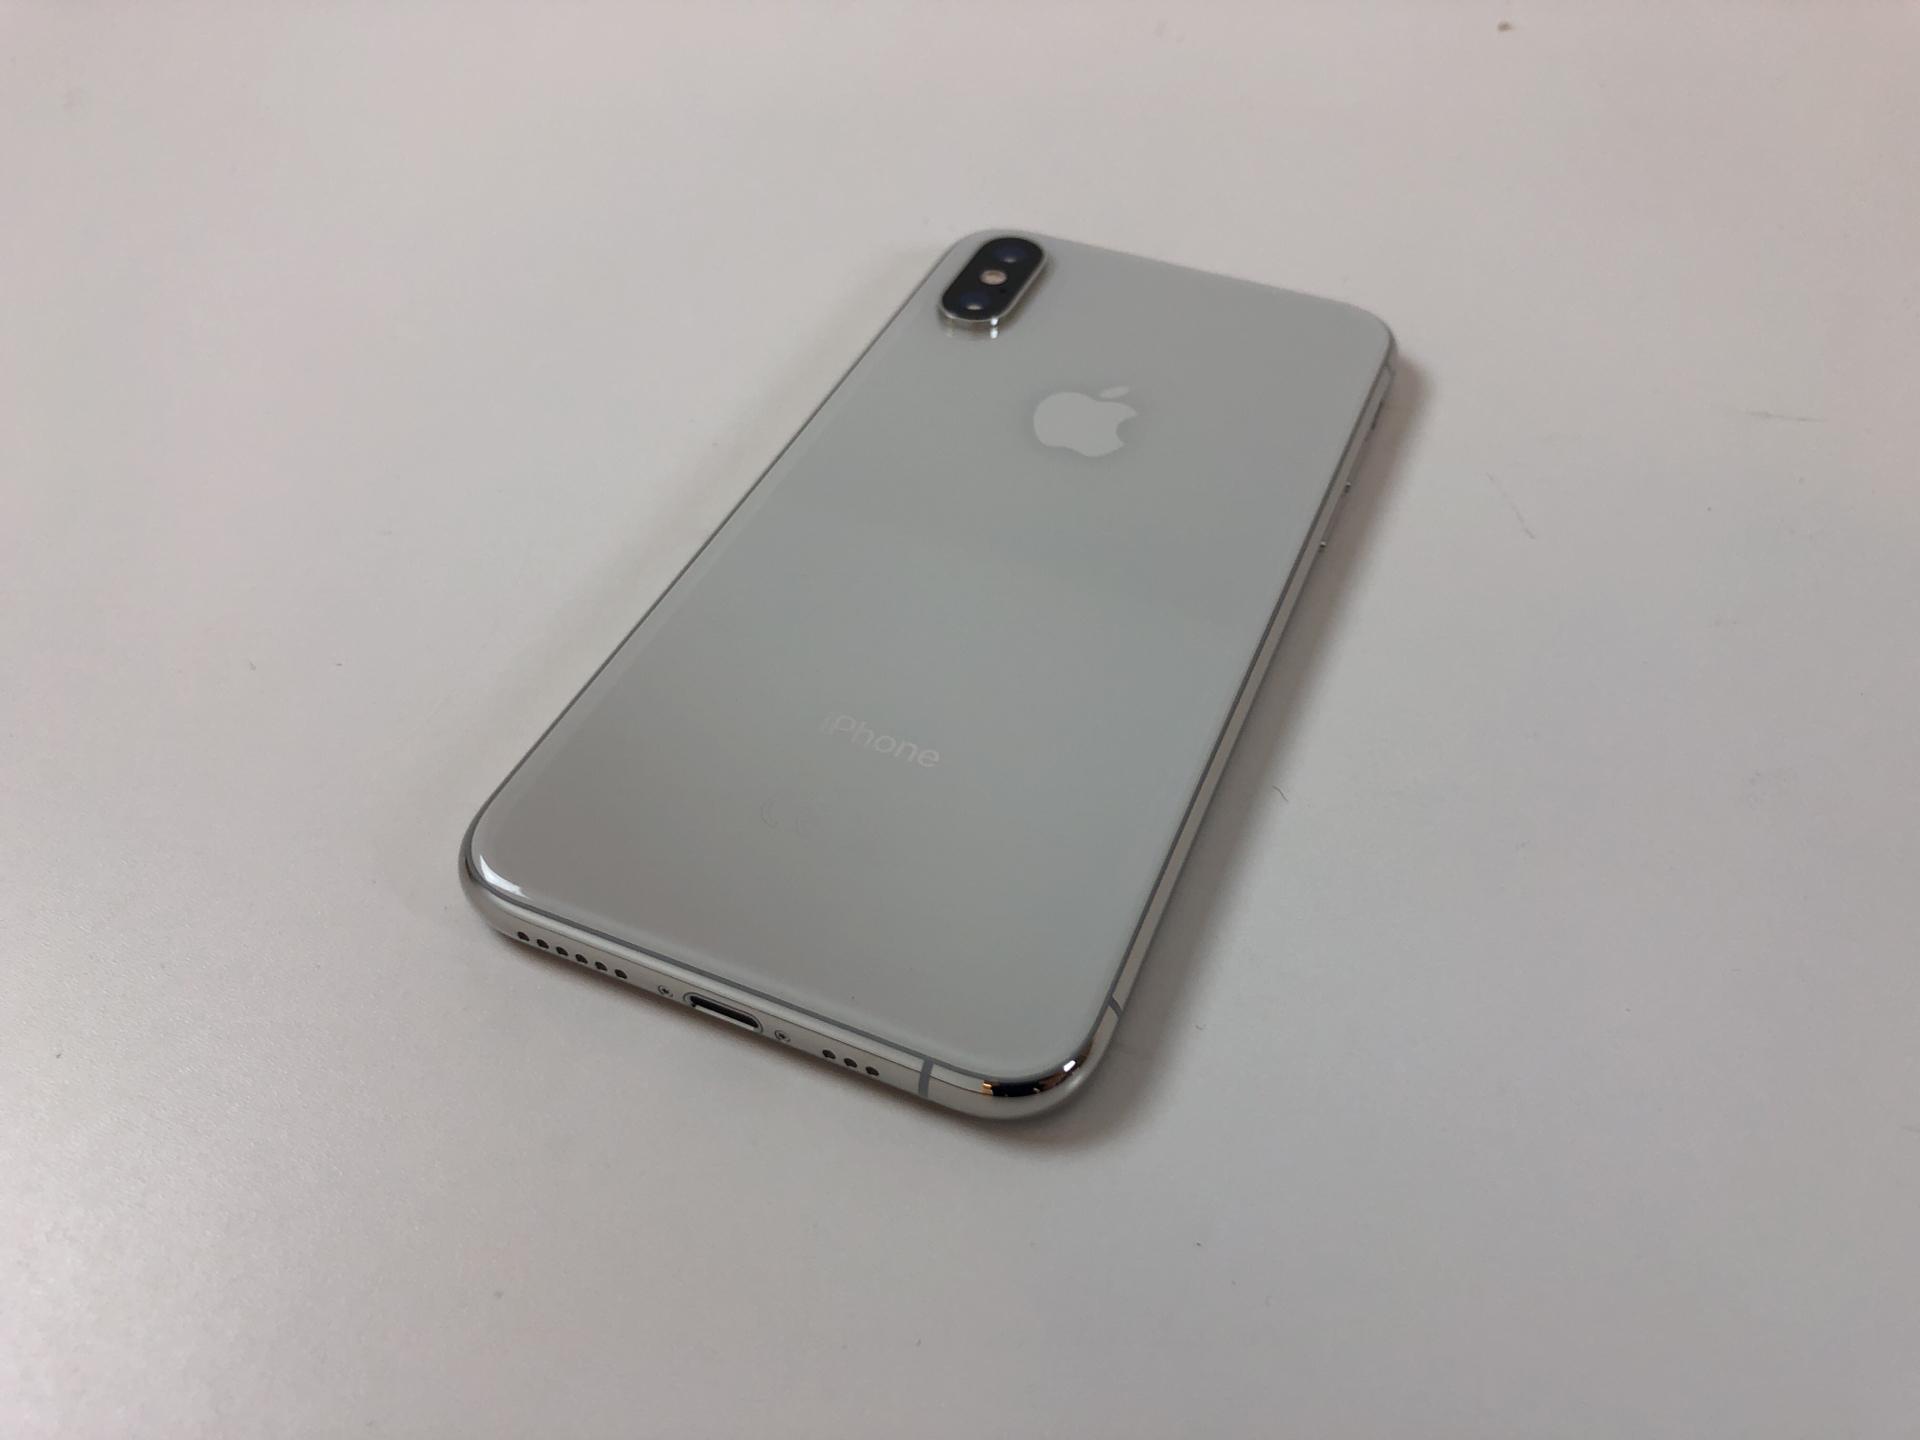 iPhone XS, 256GB, Silver, bild 3